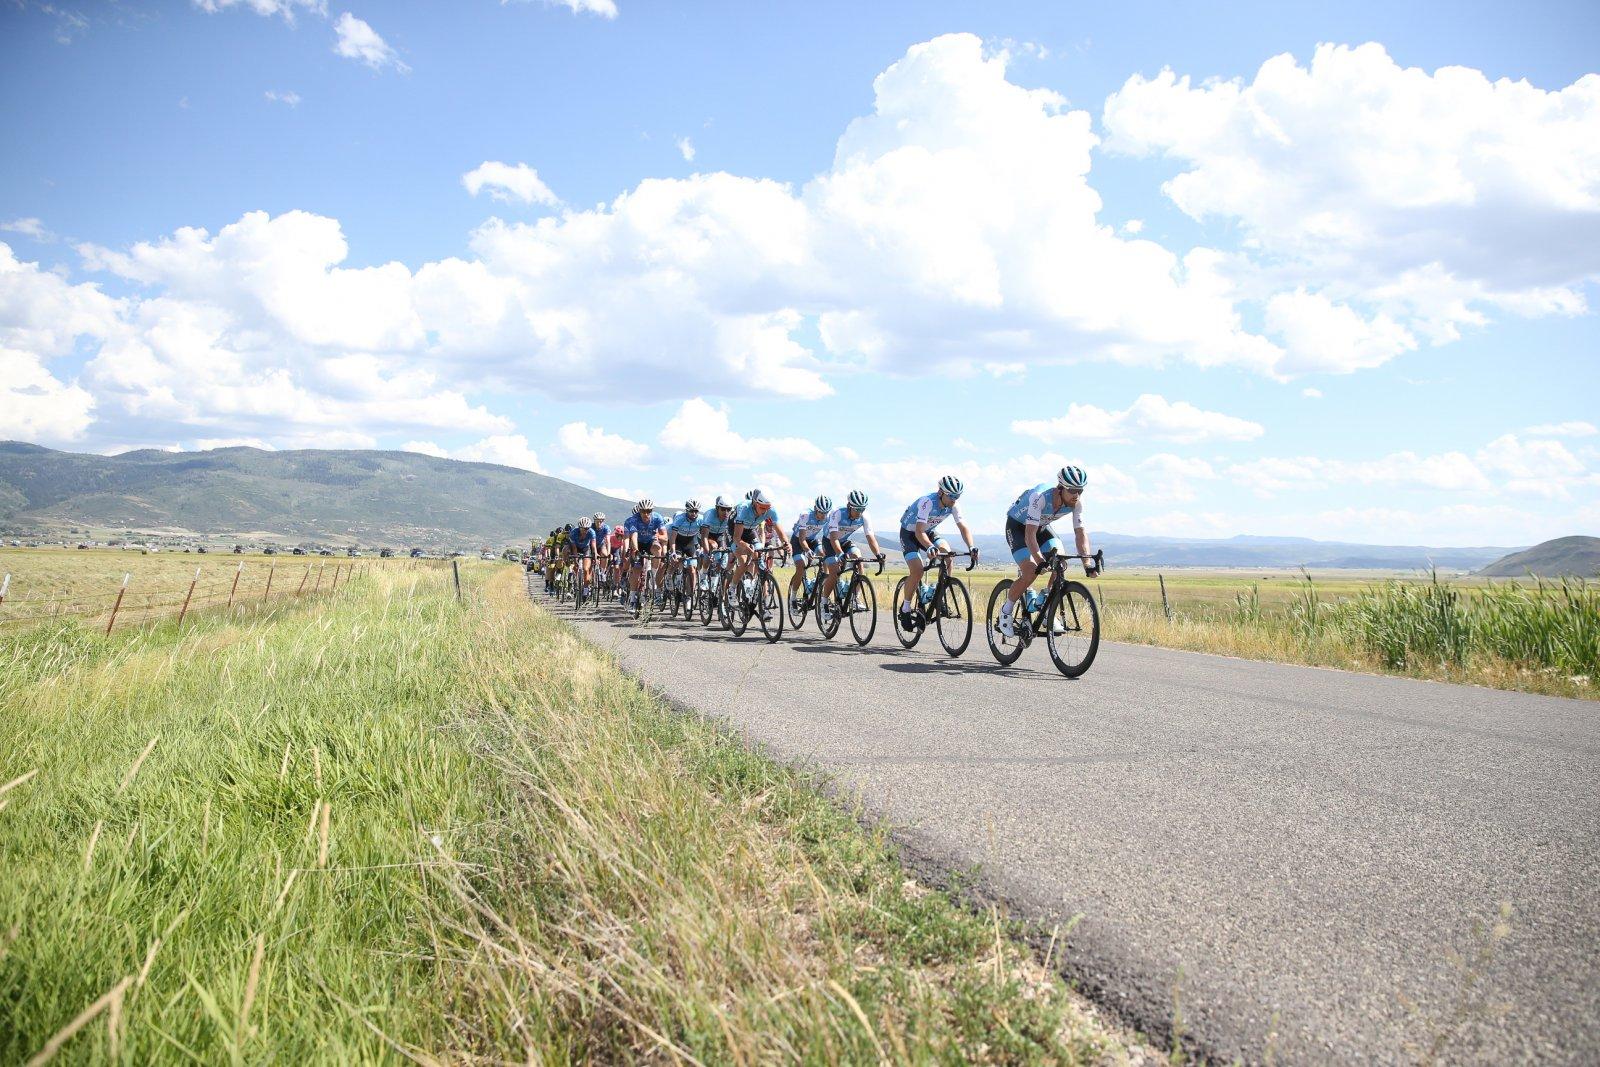 The peloton charges through beautiful farmland.